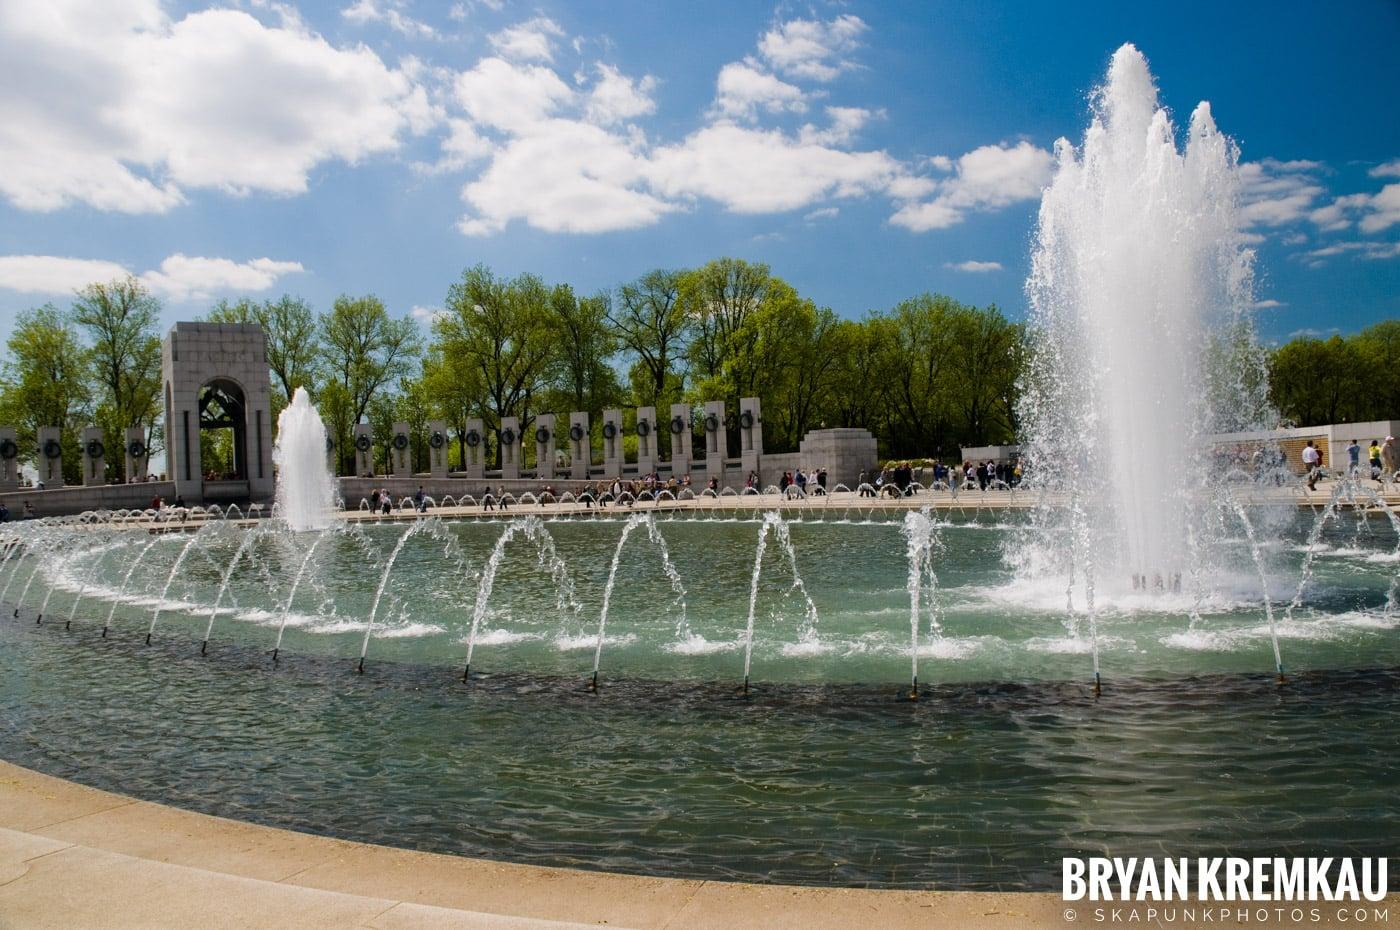 Washington, DC Trip - Day 2 - 4.9.10 (15)